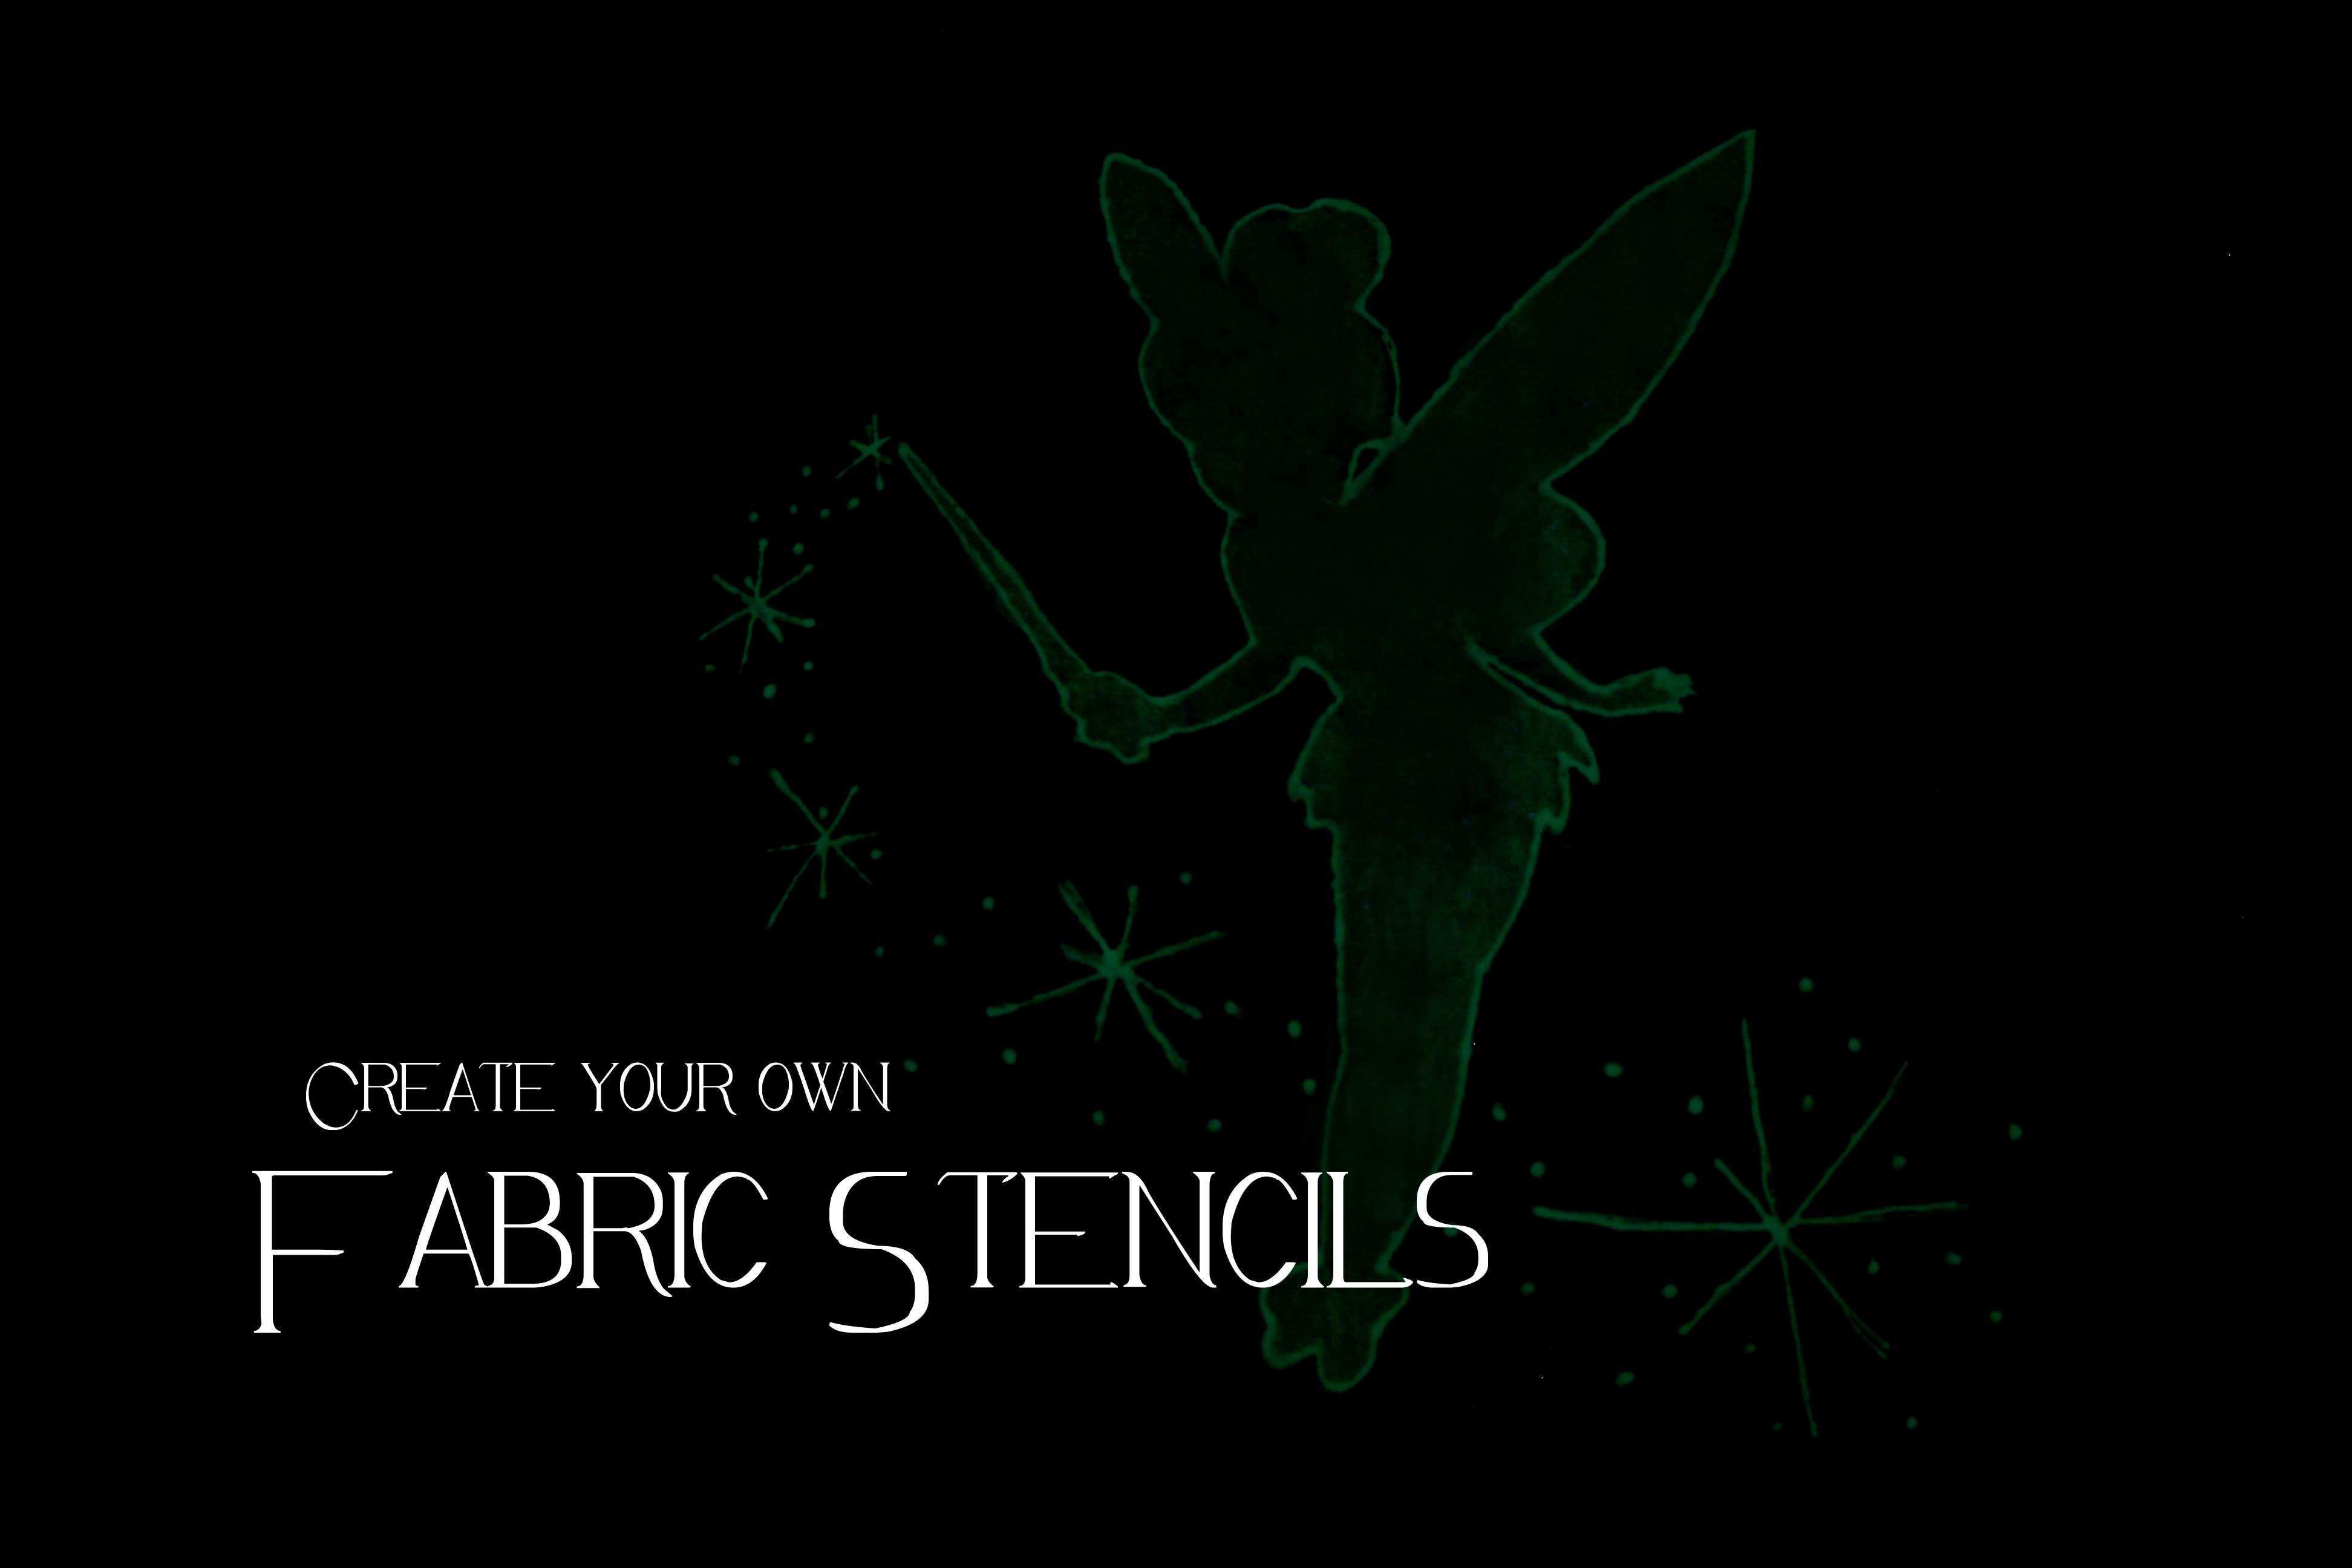 Fabric Stencils